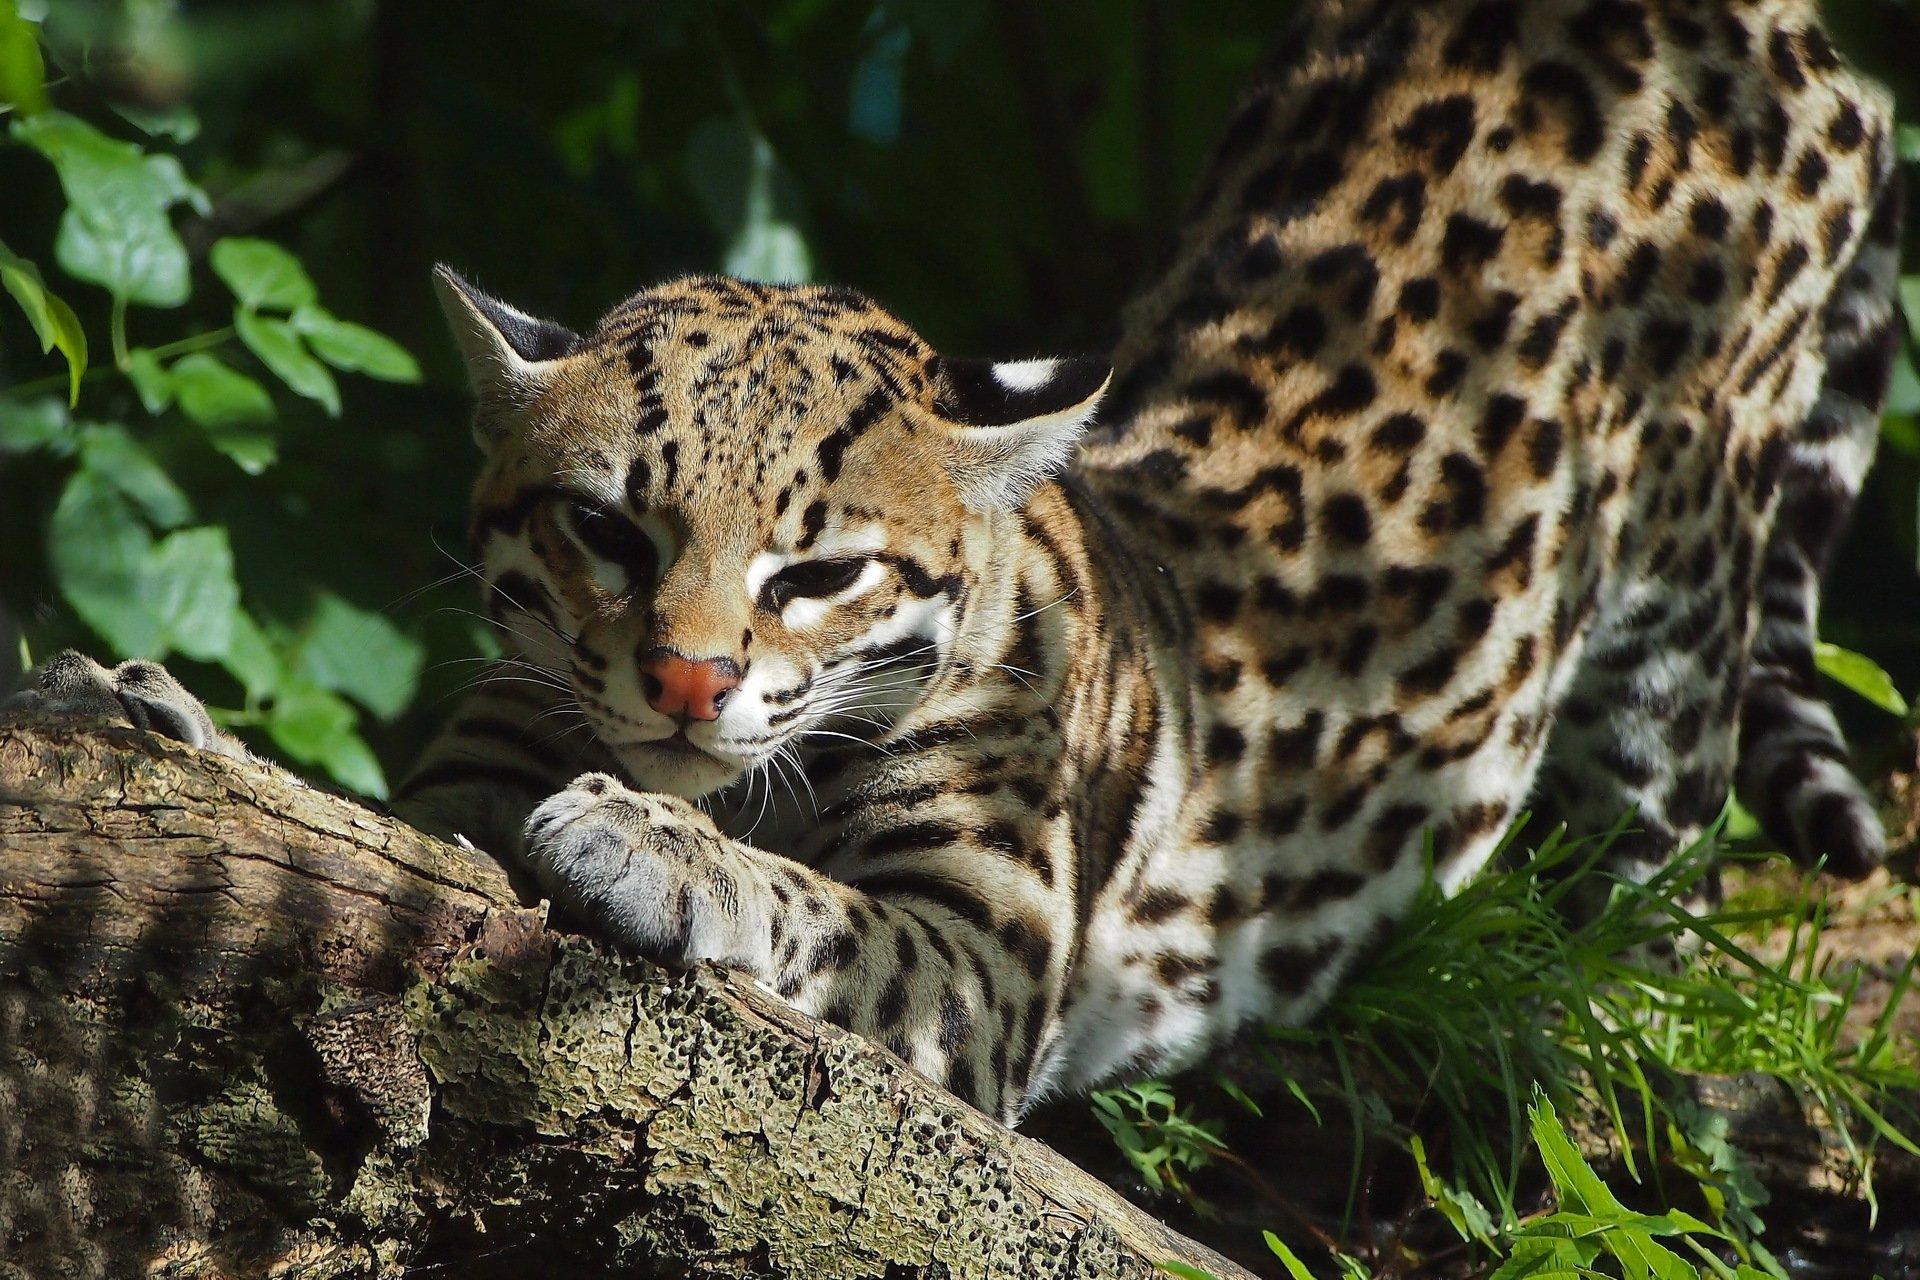 дикие кошки мира фото и названия природа